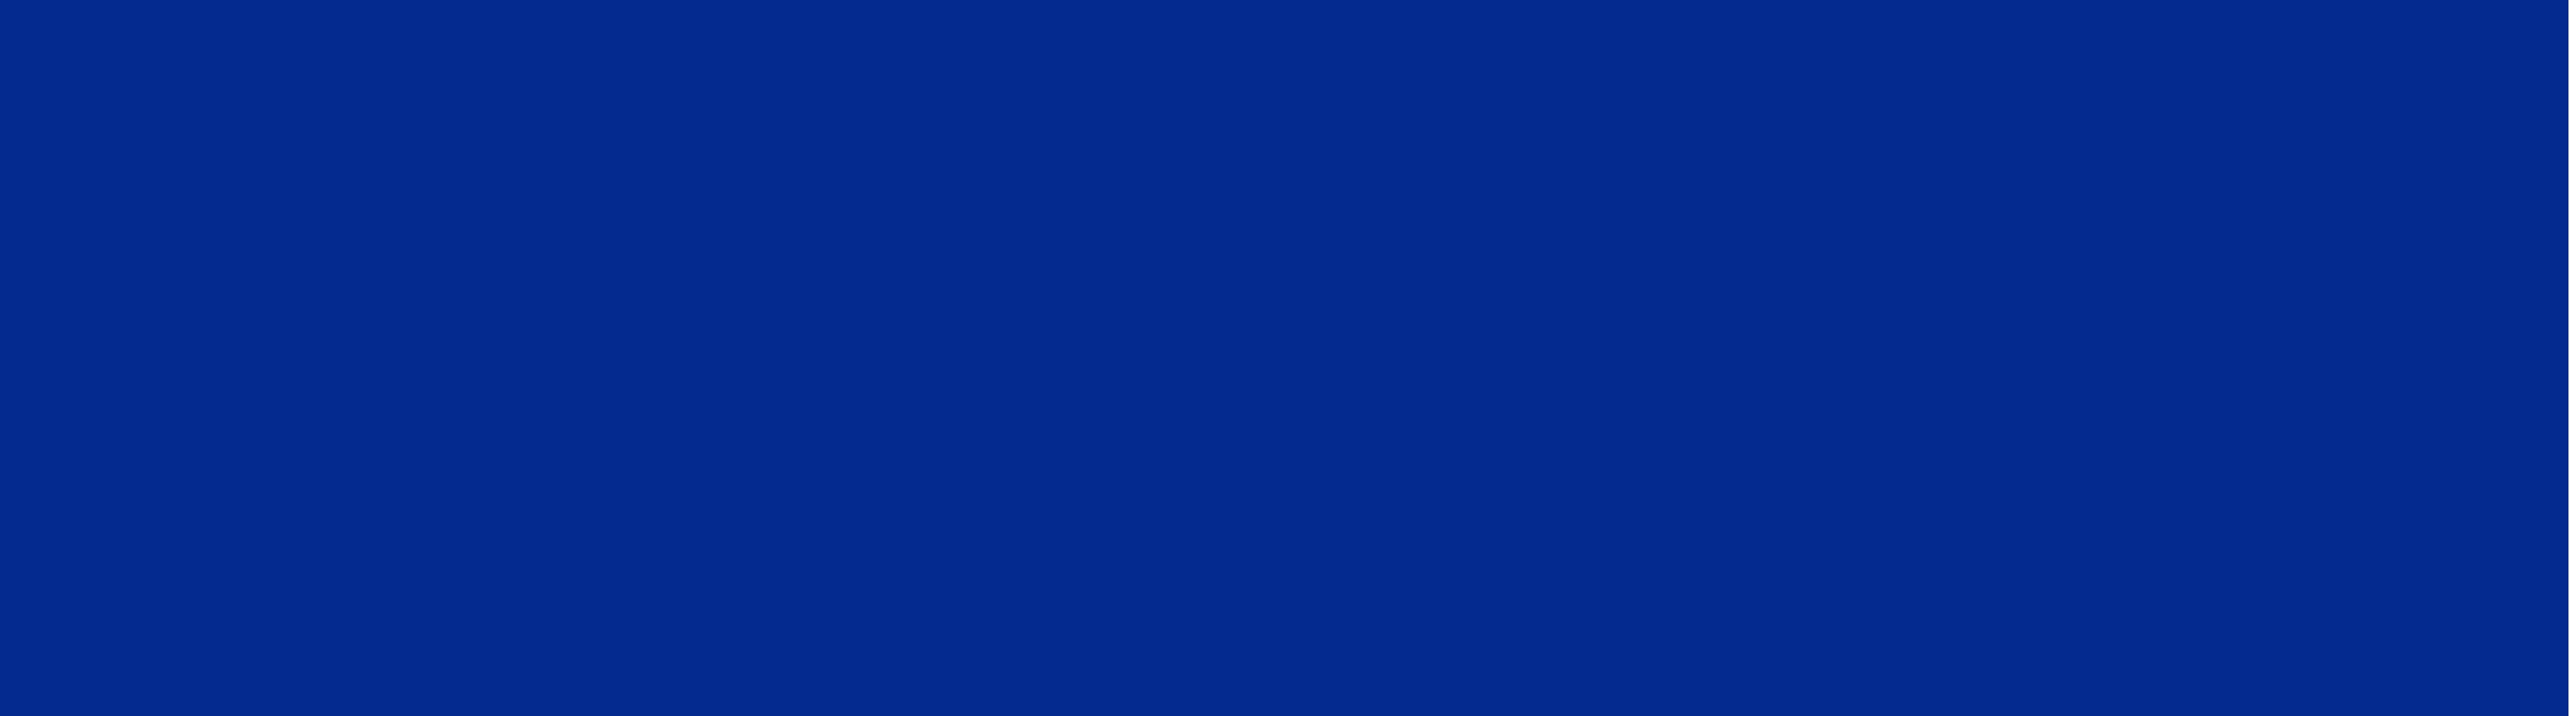 BEA Group